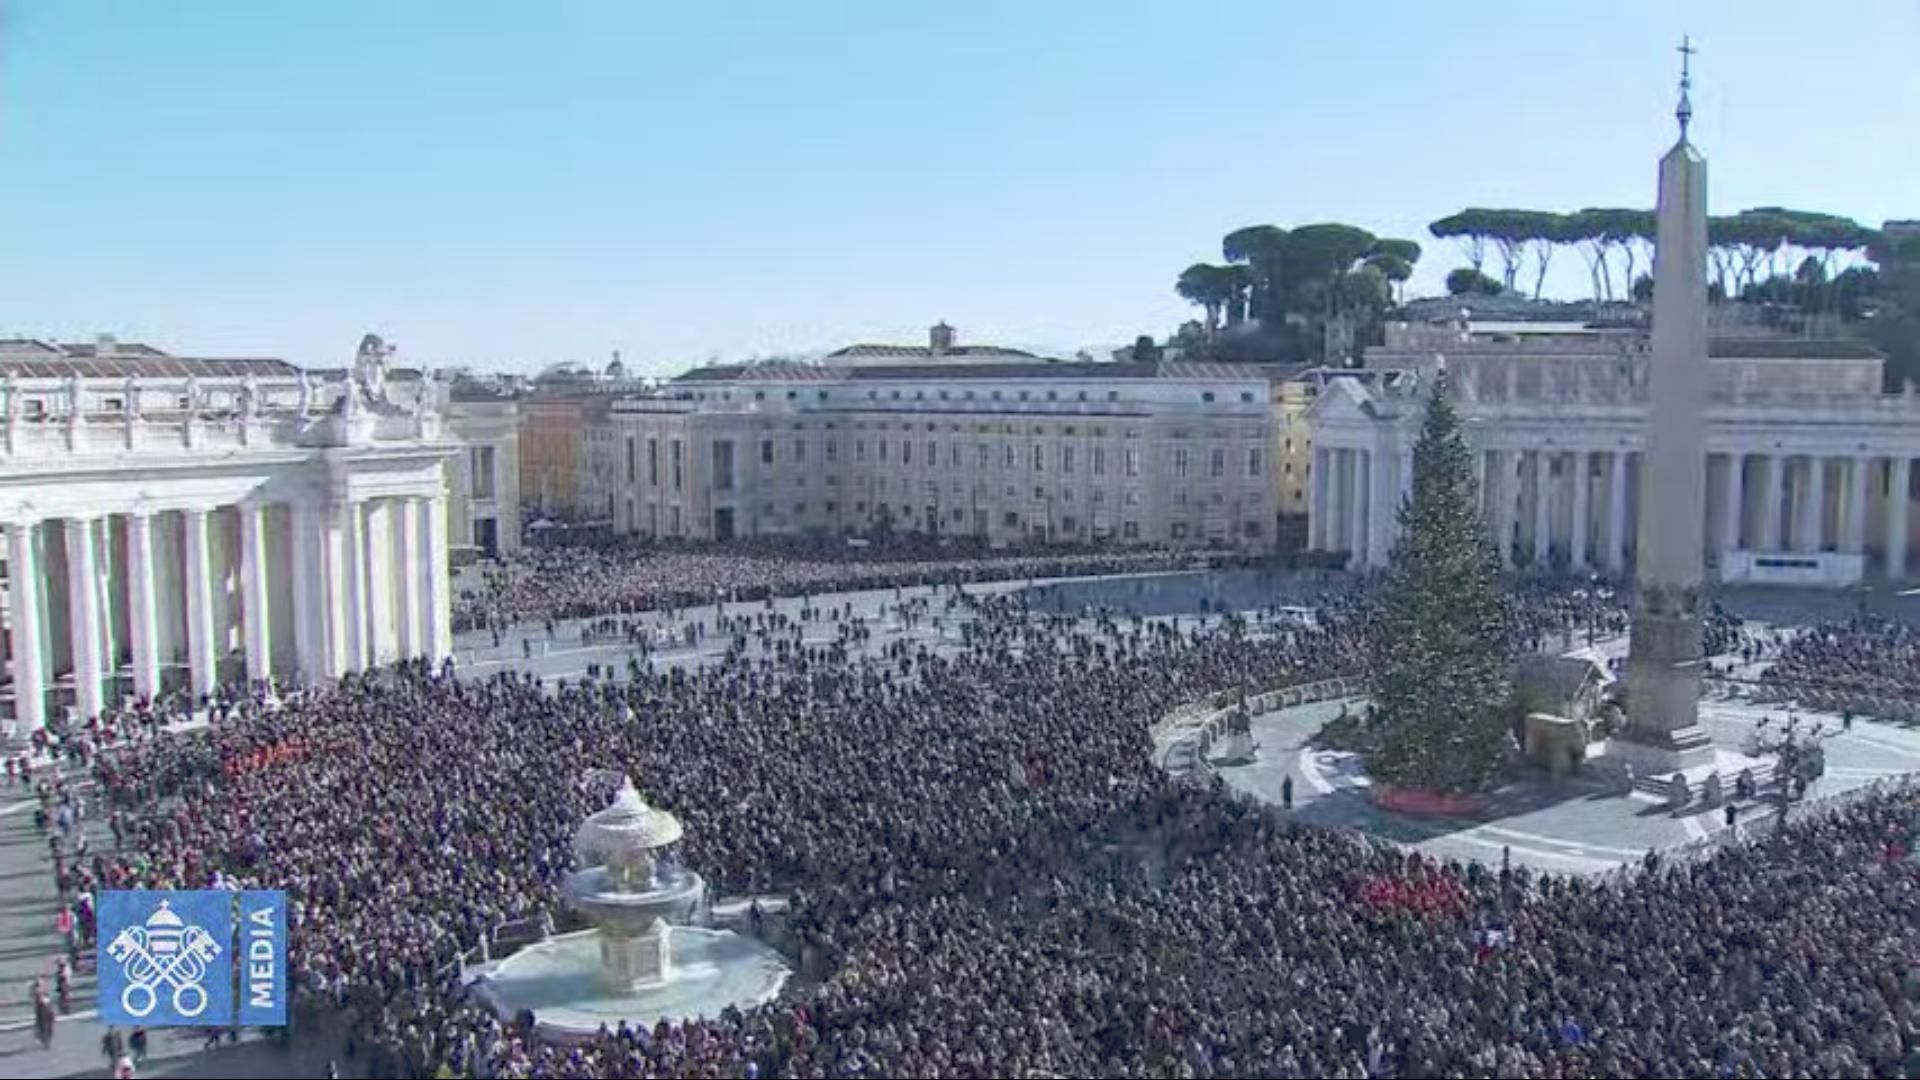 Angélus du 29 déc. 2019, capture @ Vatican Media